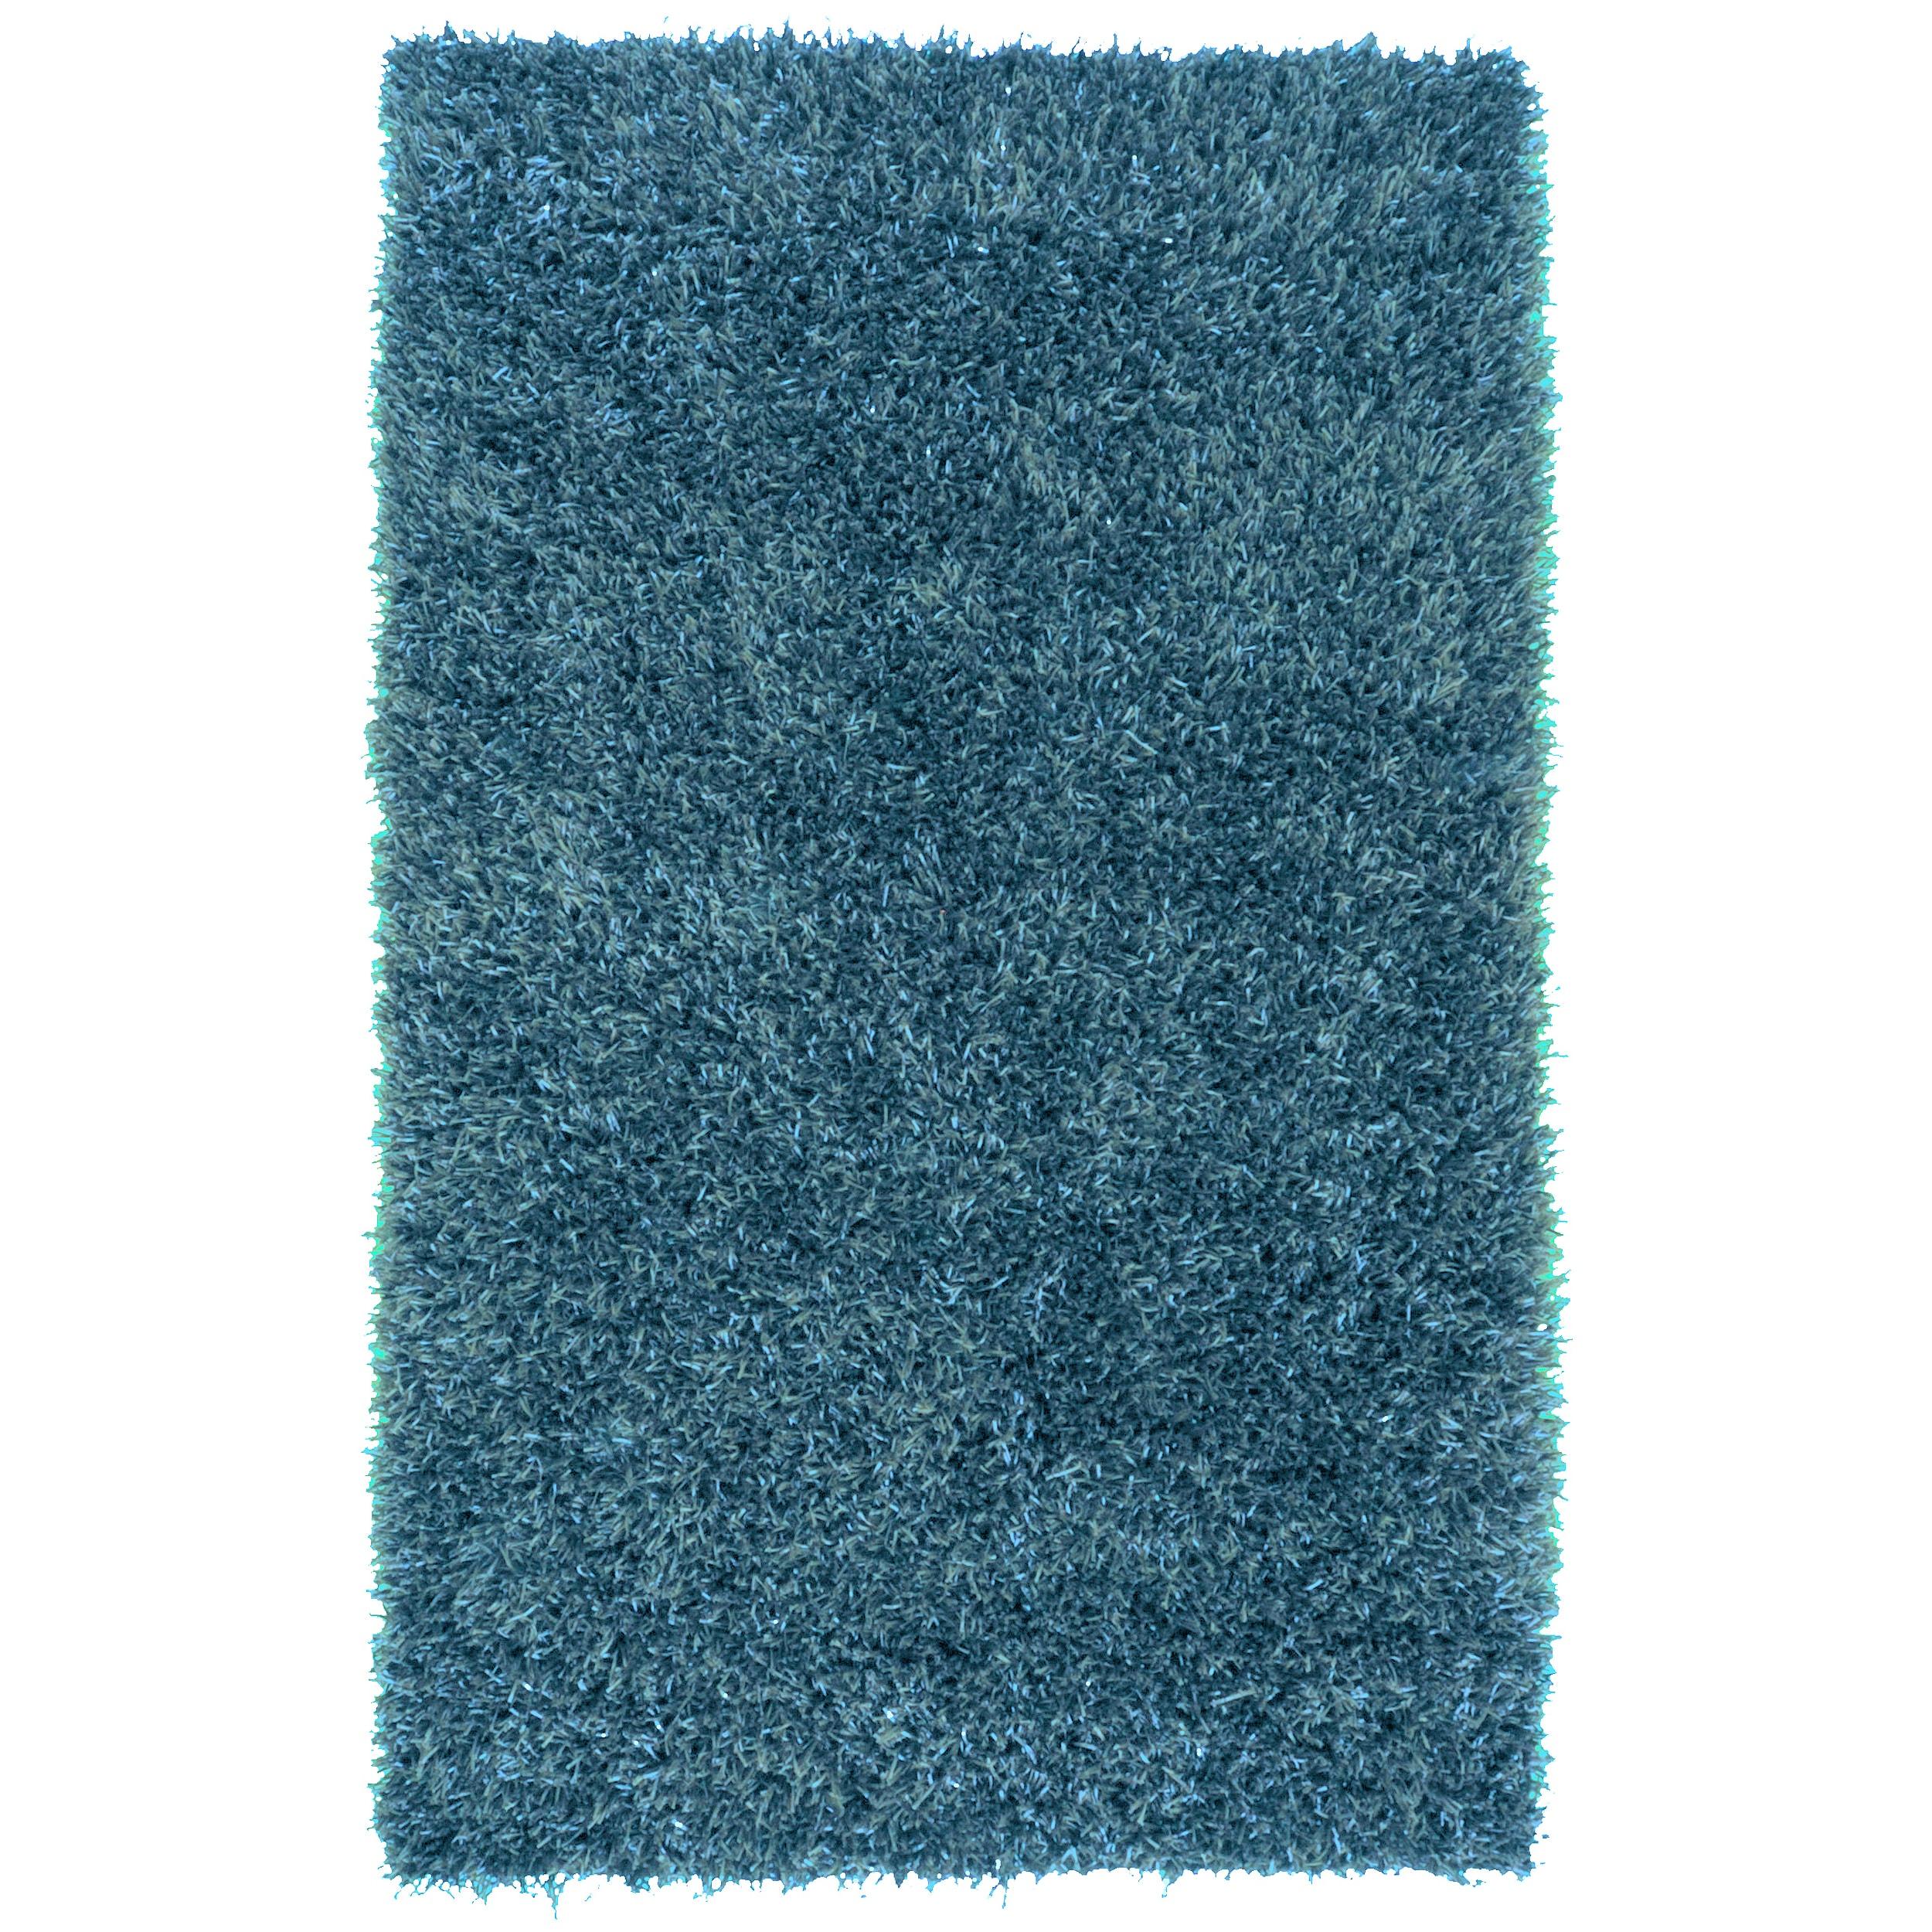 Nice Hand Woven Teal Blue Milwaukee Soft Plush Shag Rug (8u0027 X ...